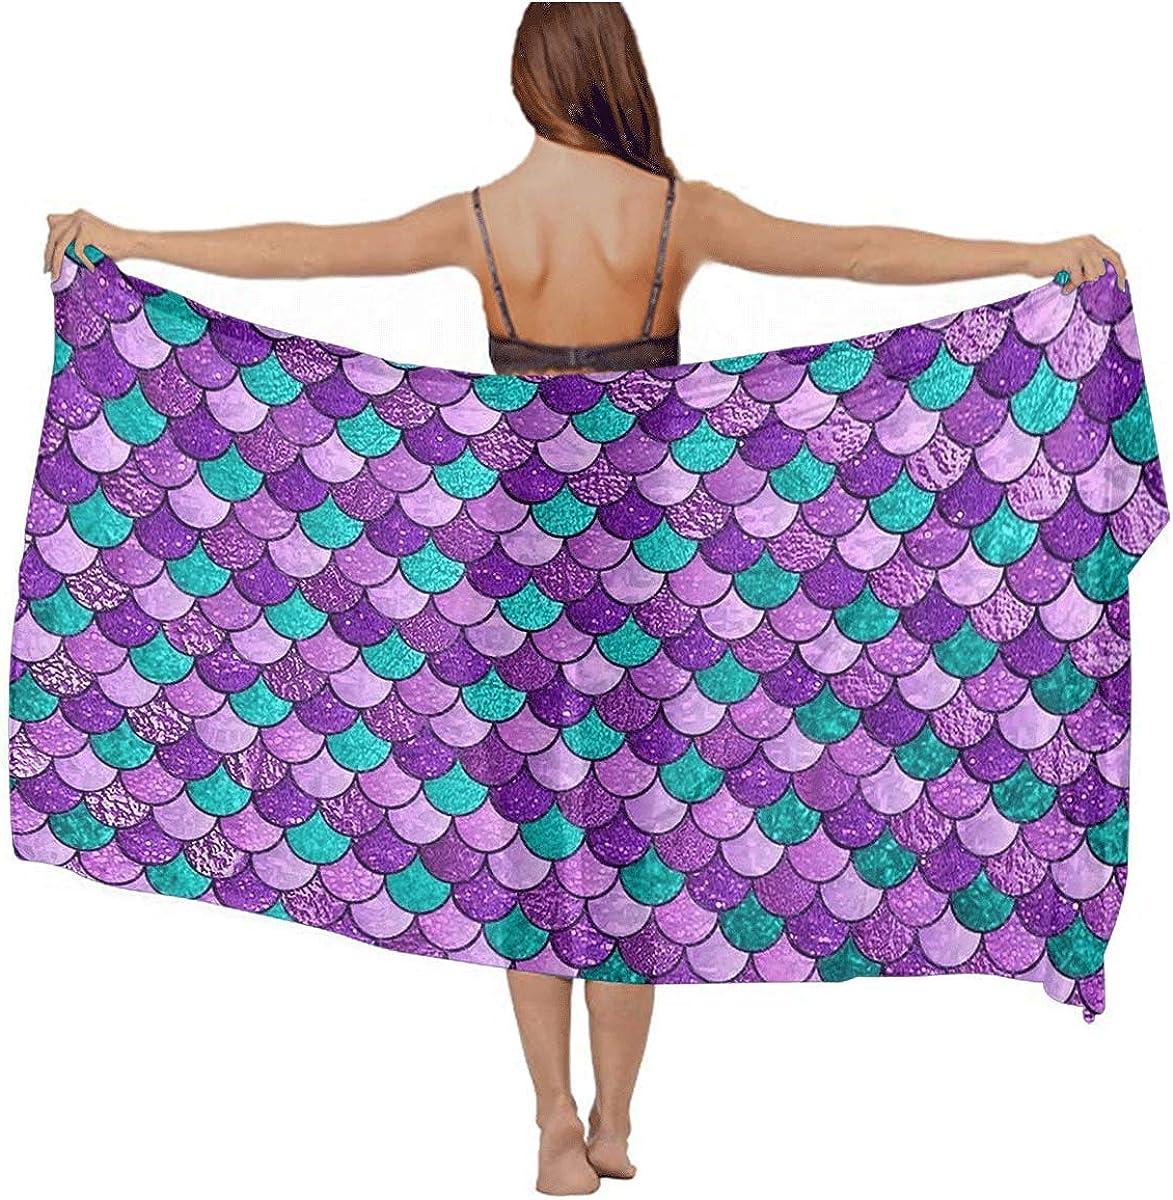 Women Gift Bikini Cover Up Sarong Wrap Scarf Pareo Dress for Party, Wedding